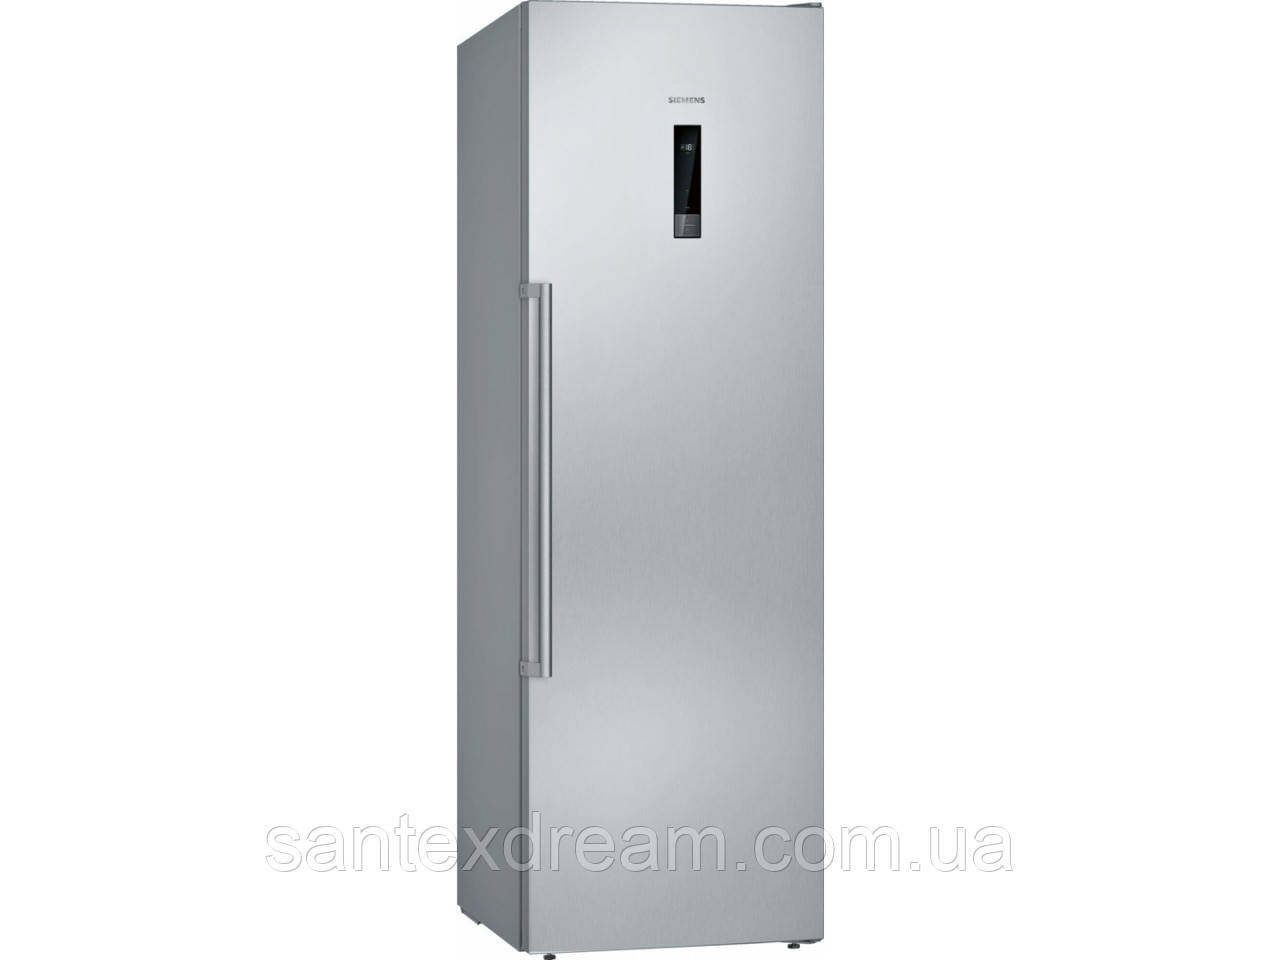 Морозильная камера Siemens GS36NBI3P